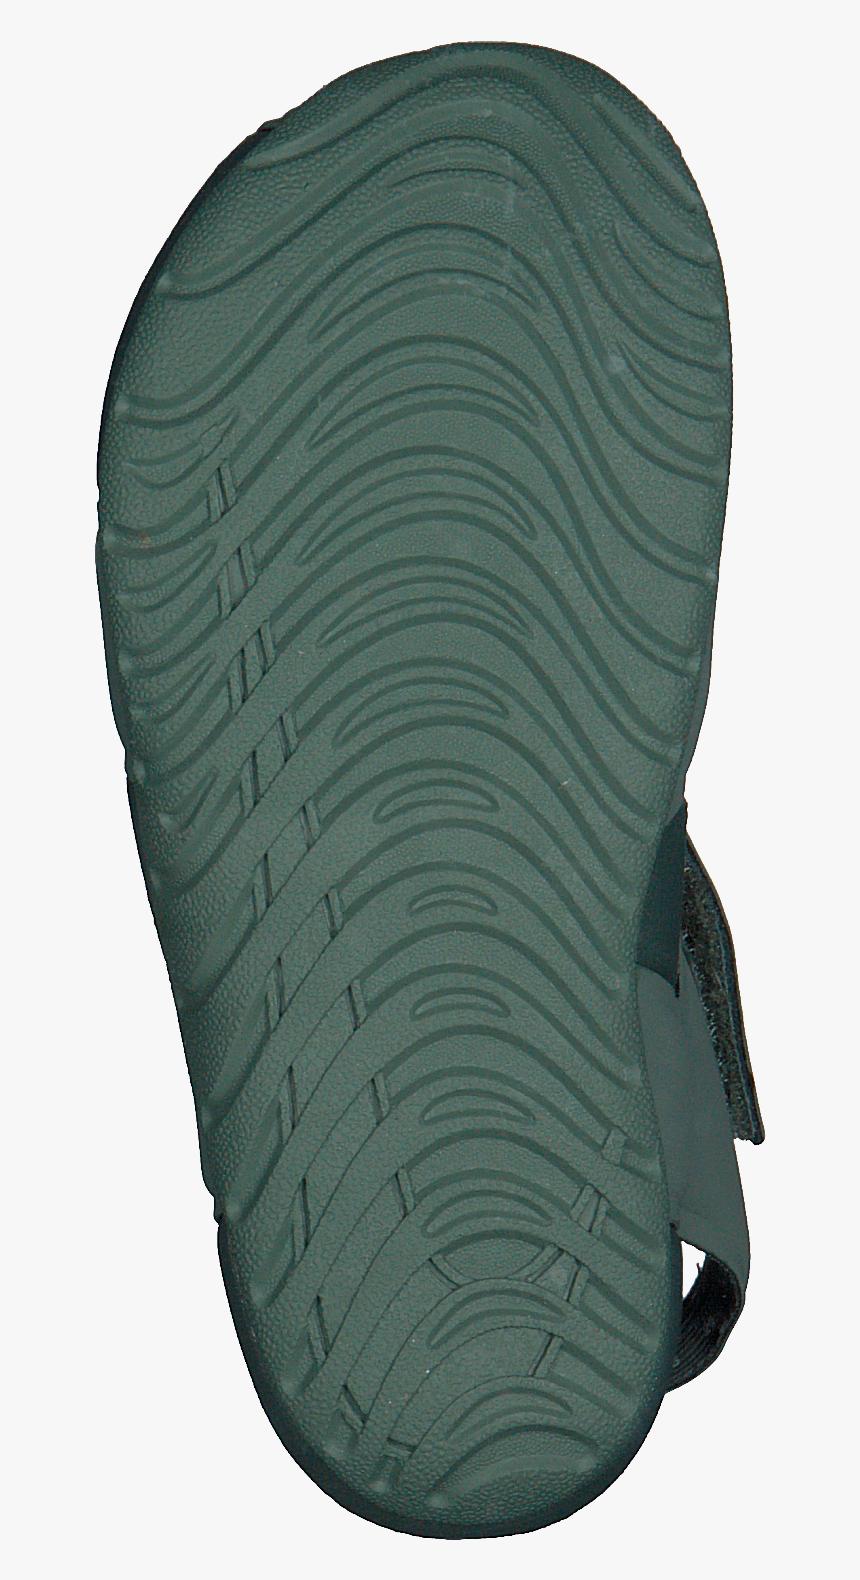 mas fiable grandes ofertas en moda bajo costo Groene Nike Sandalen Sunray Protect Png Amazon Naruto - Snow Boot ...